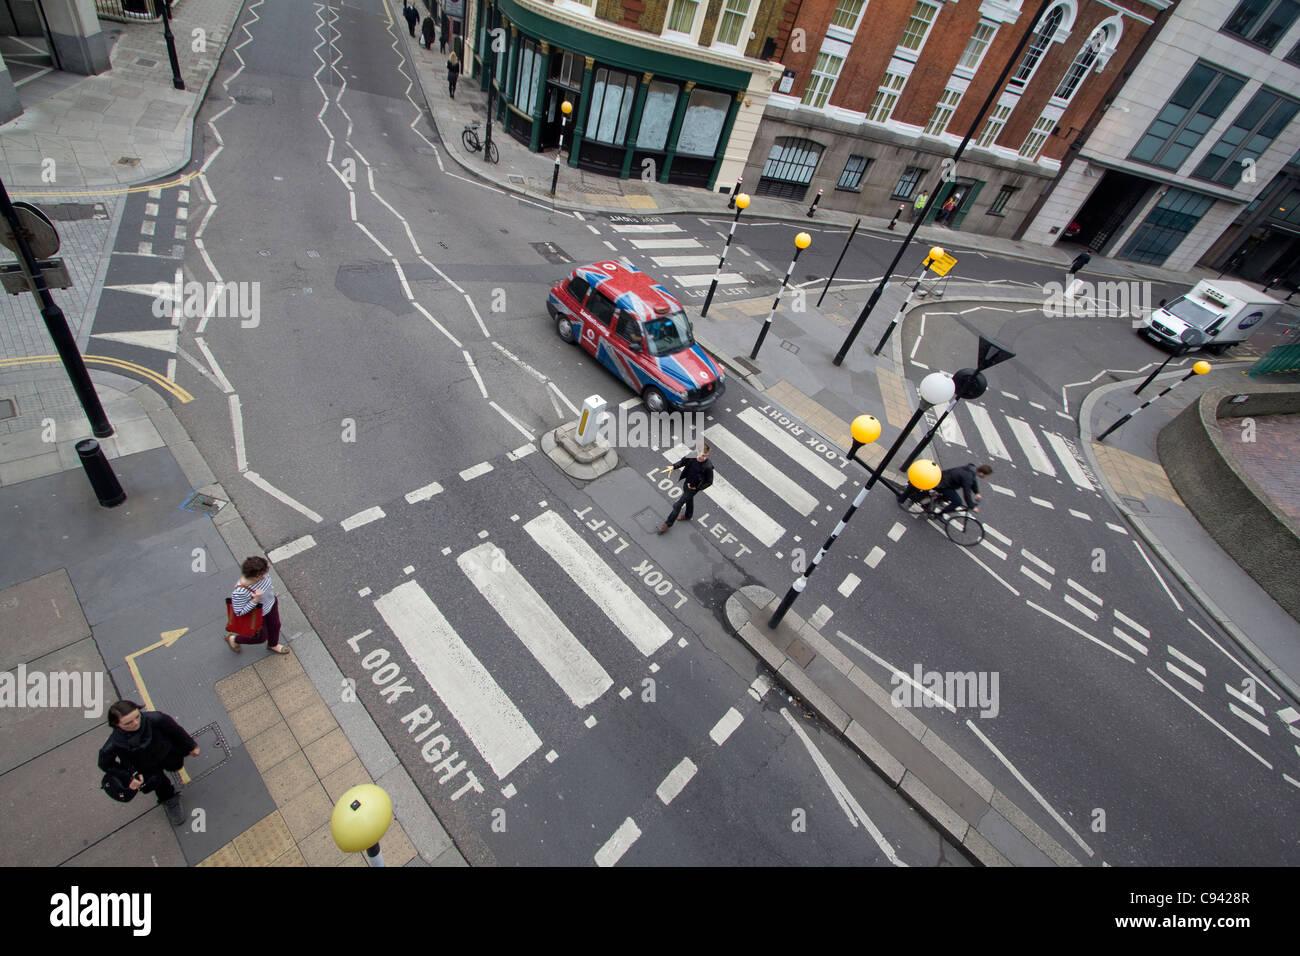 Zebra Crossing Or Pedestrian Crossing Central London Stock